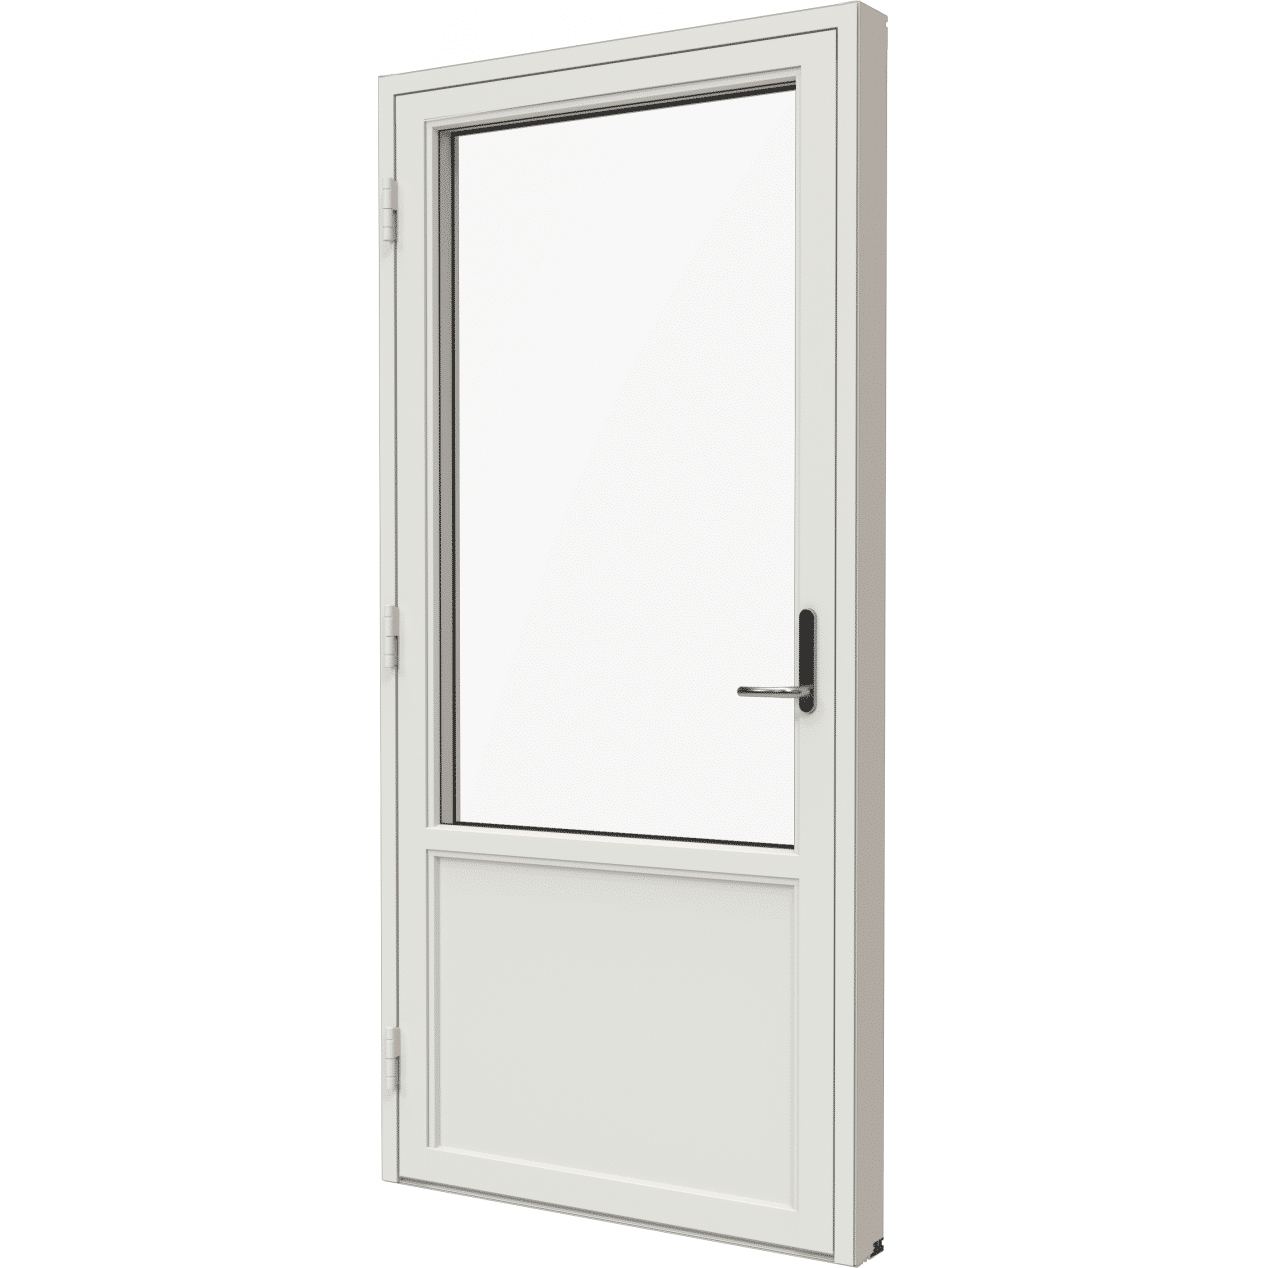 Kronfönster Air fönsterdörr br